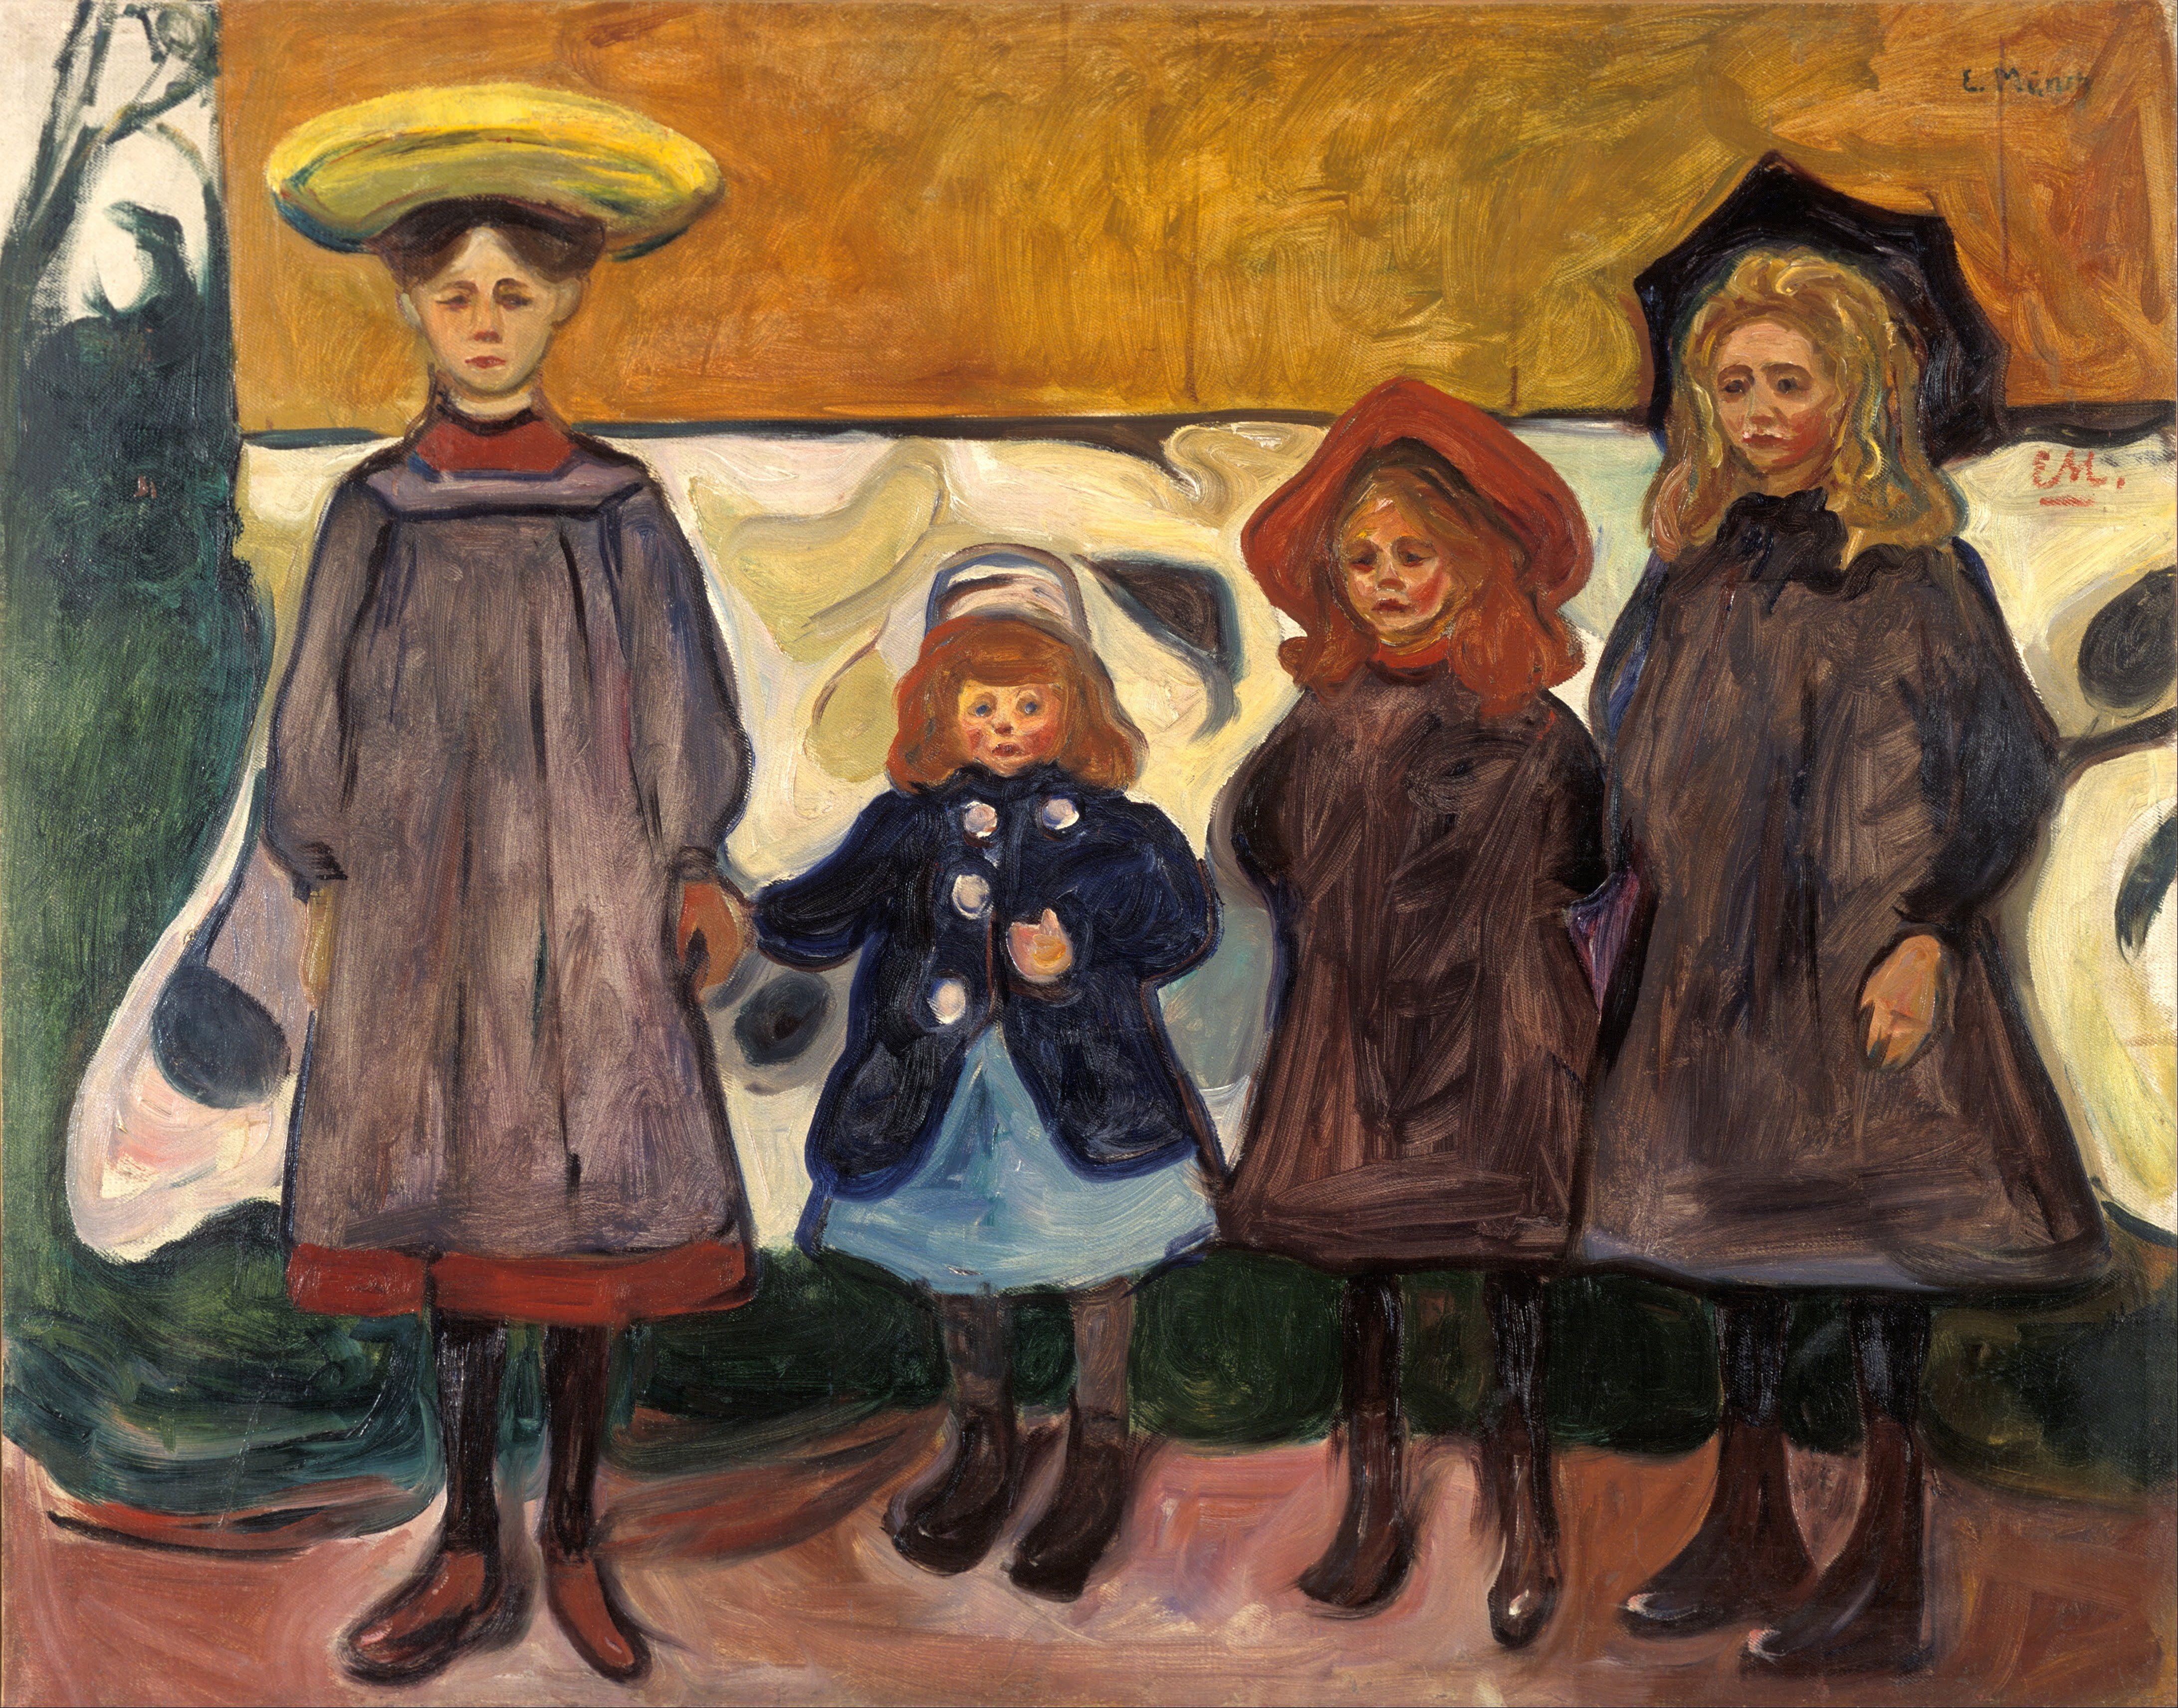 ... Munch, Edvard (1863-1944) - 1912 Kragero Landscape (Metropolitan Museum  of